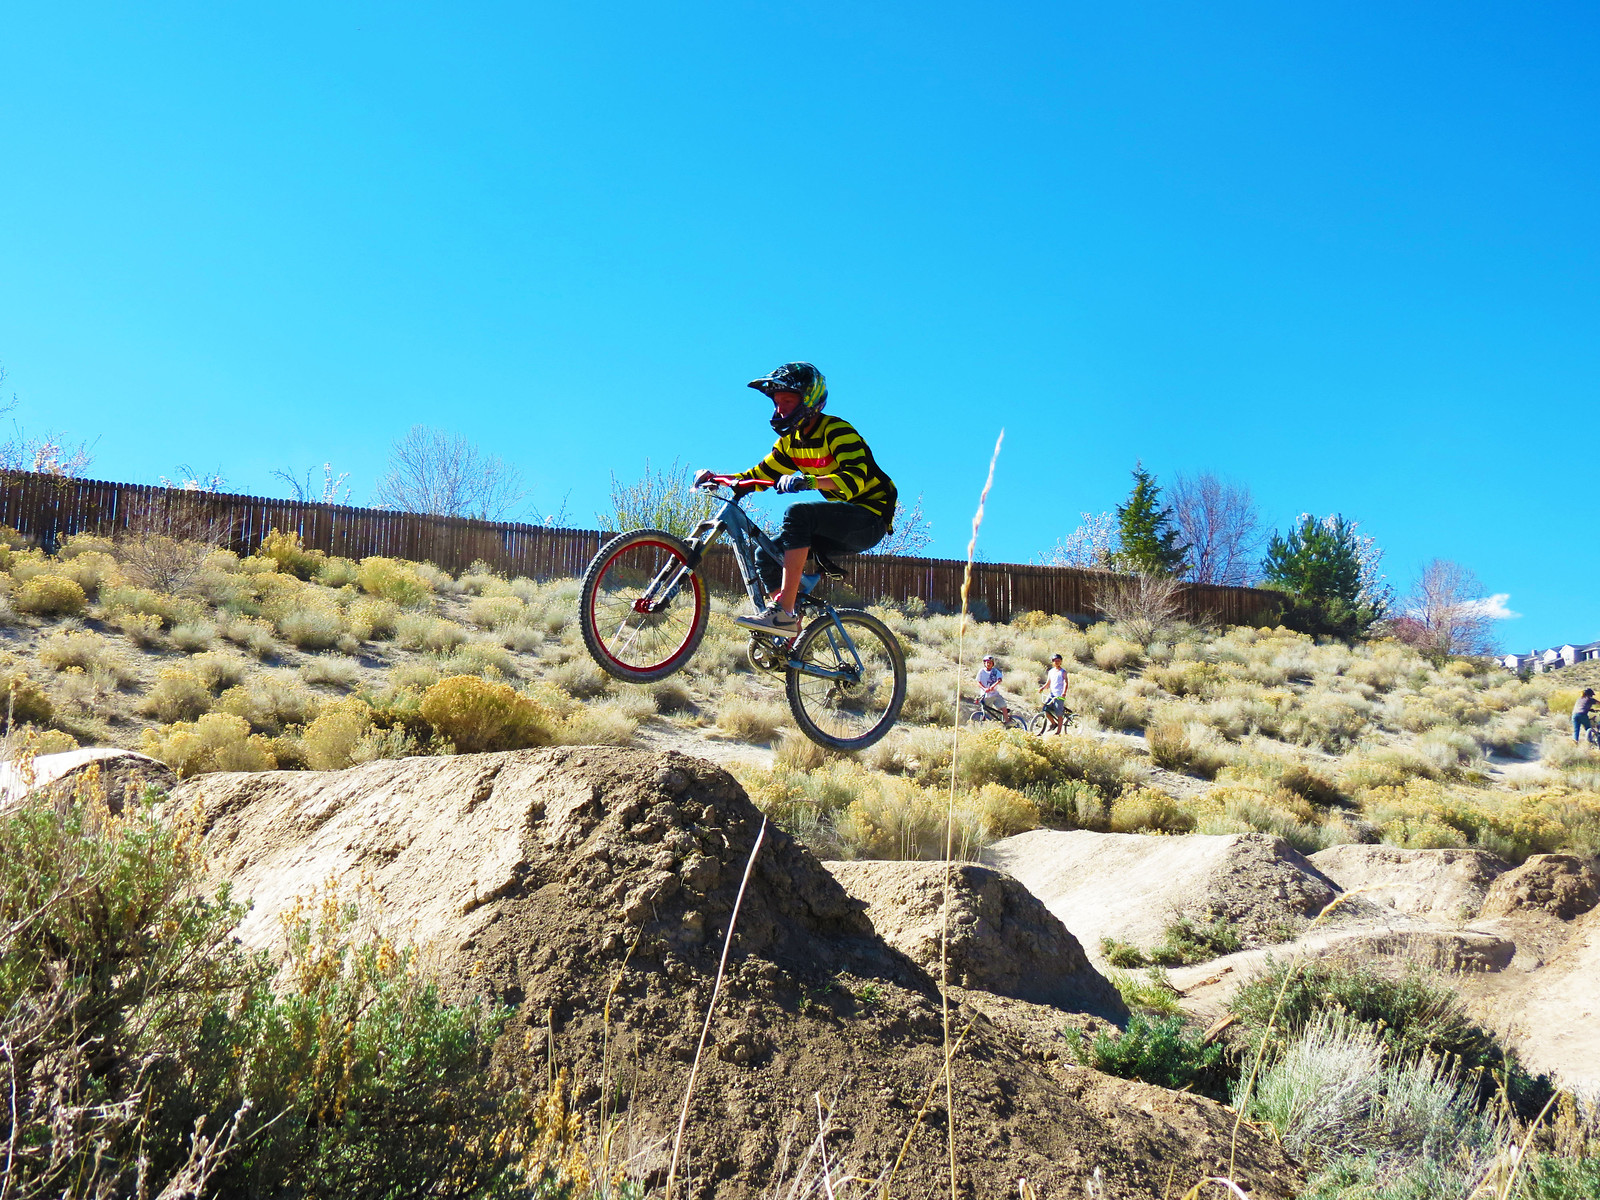 day 3 jump 1 - Moosey - Mountain Biking Pictures - Vital MTB